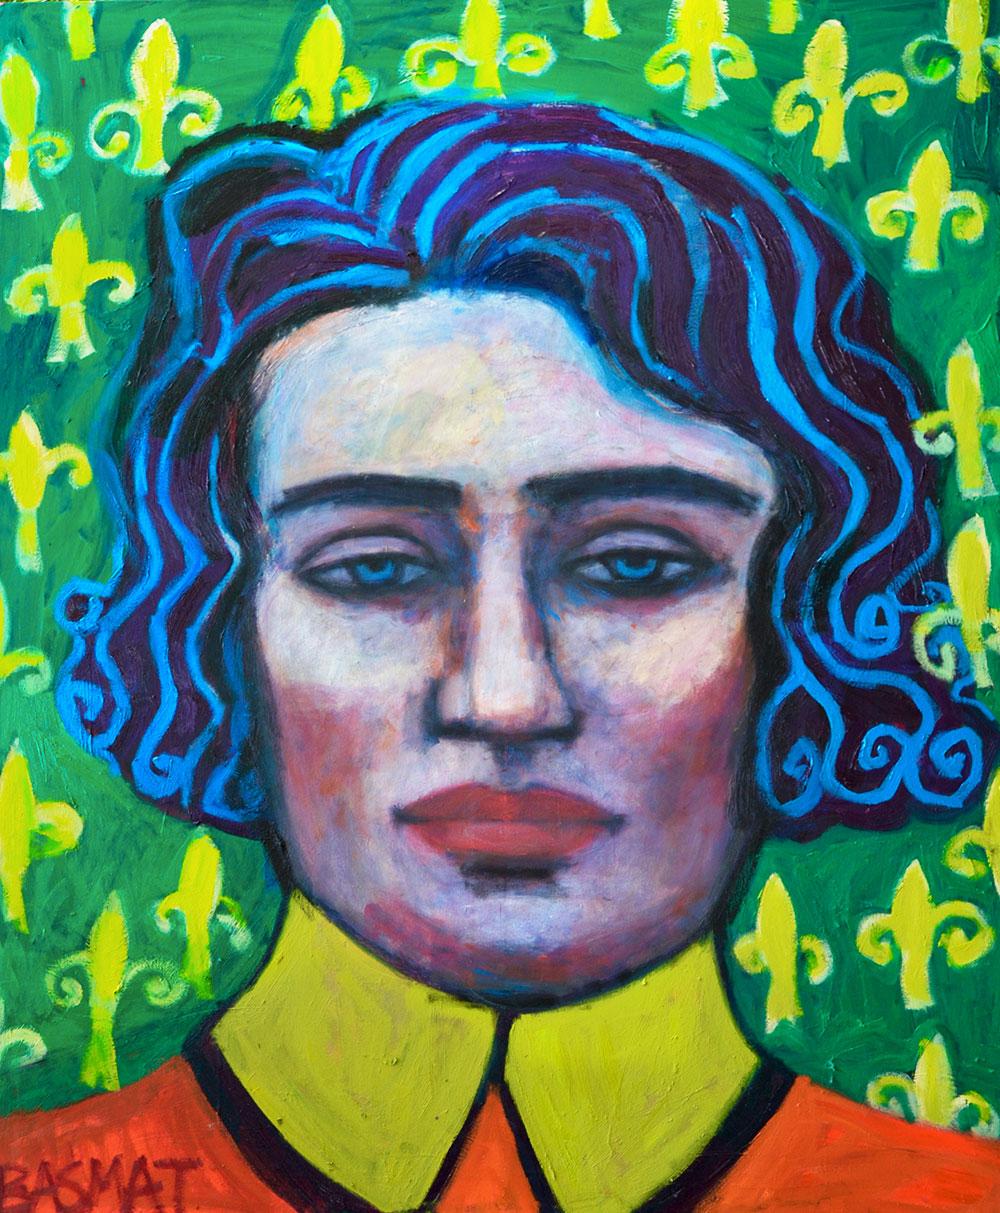 The Prince with the Blue Hair   -  140cm x 150cm,Oil on Canvas